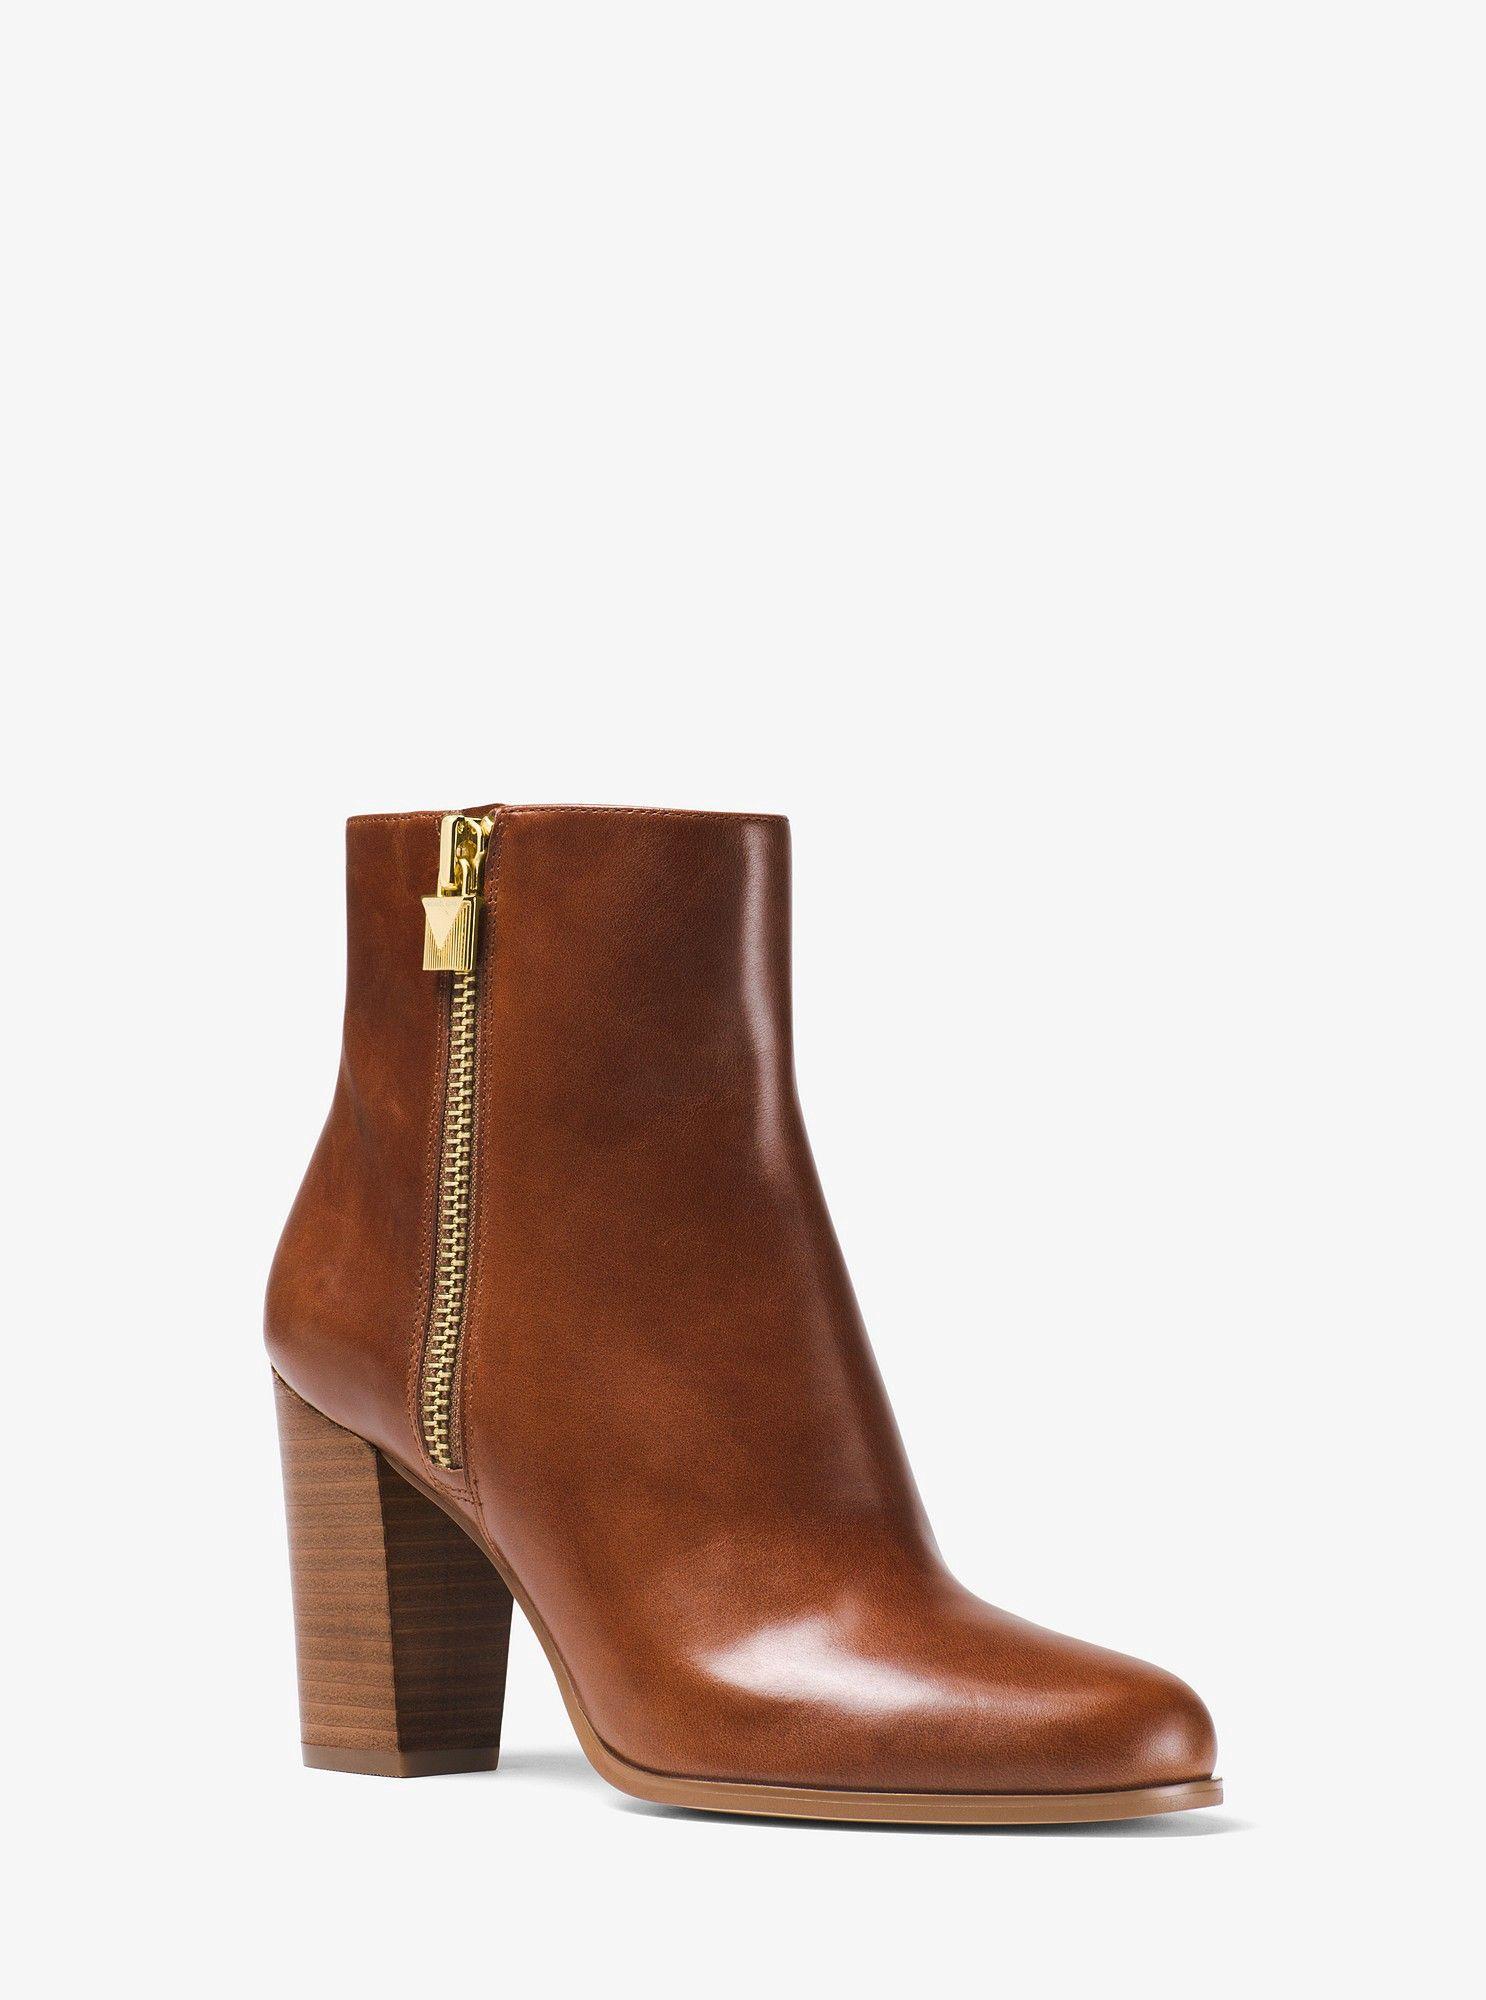 Michael Kors Margaret Leather Ankle Boot Caramel 6